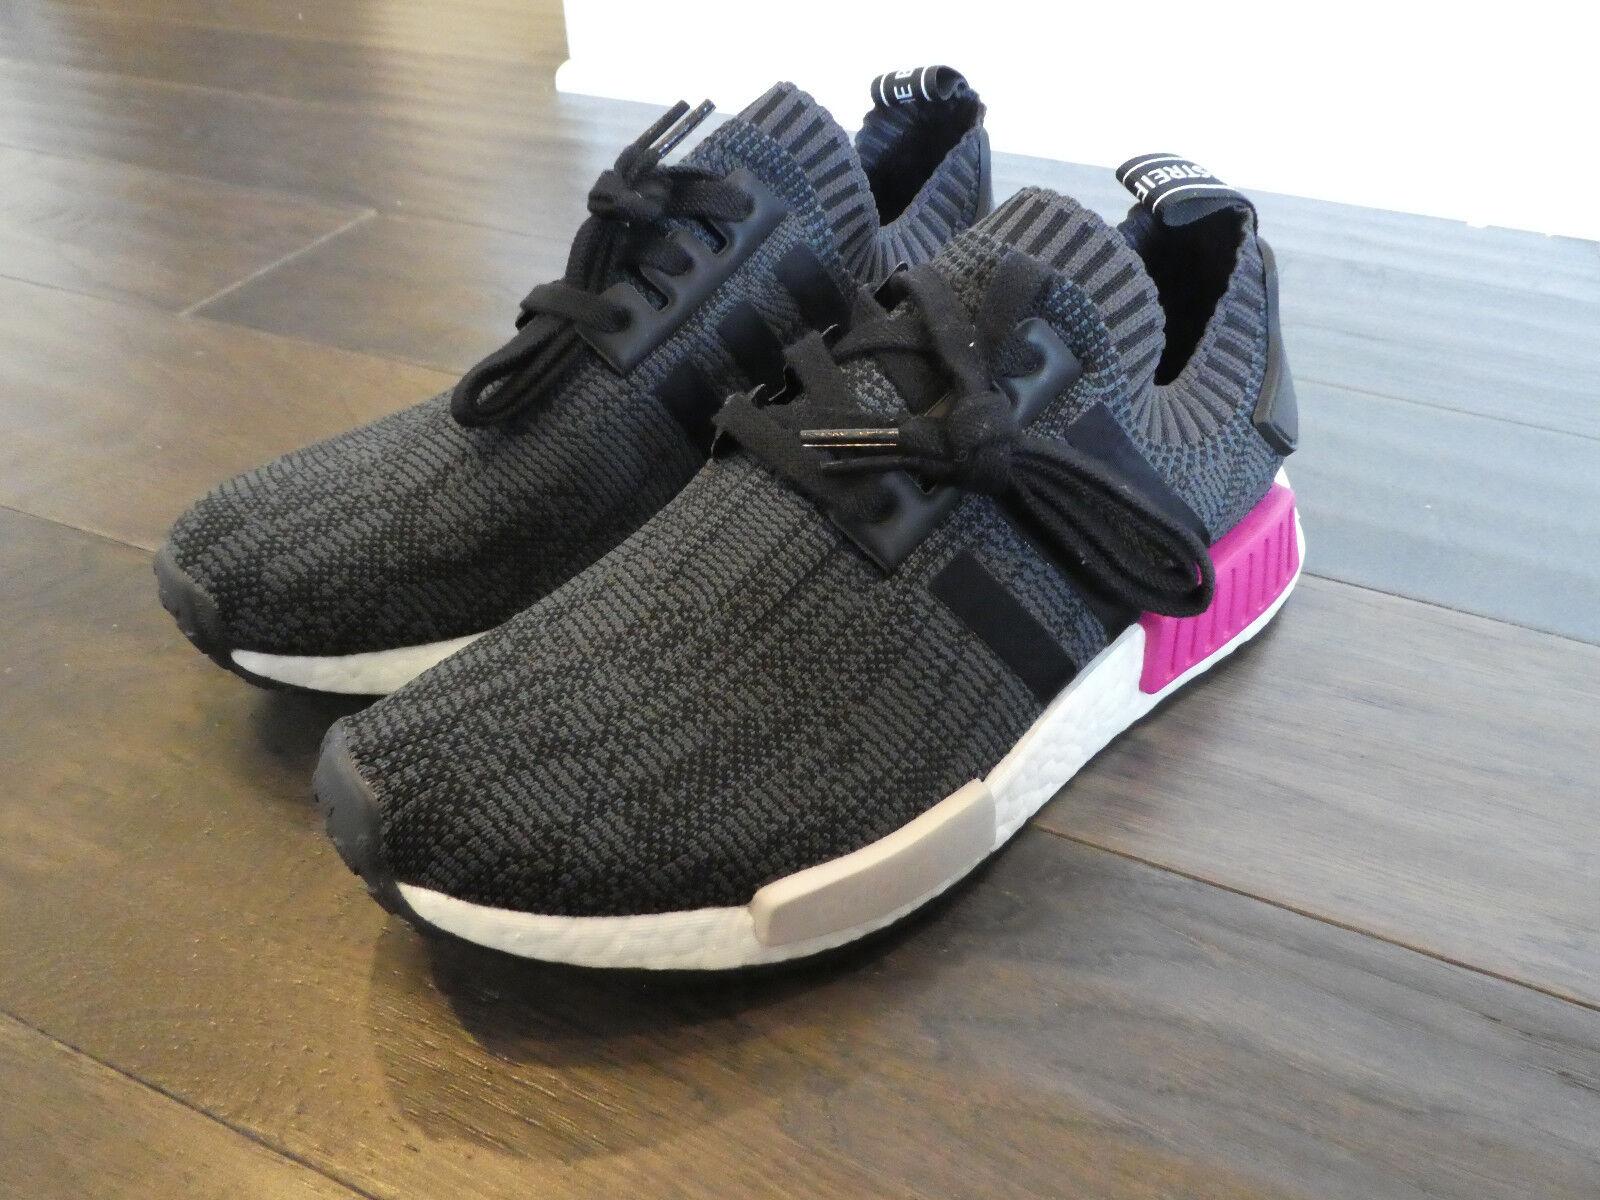 Adidas Women's NMD_R1 Boost shoes sneakers new BB2364 black PK Primeknit